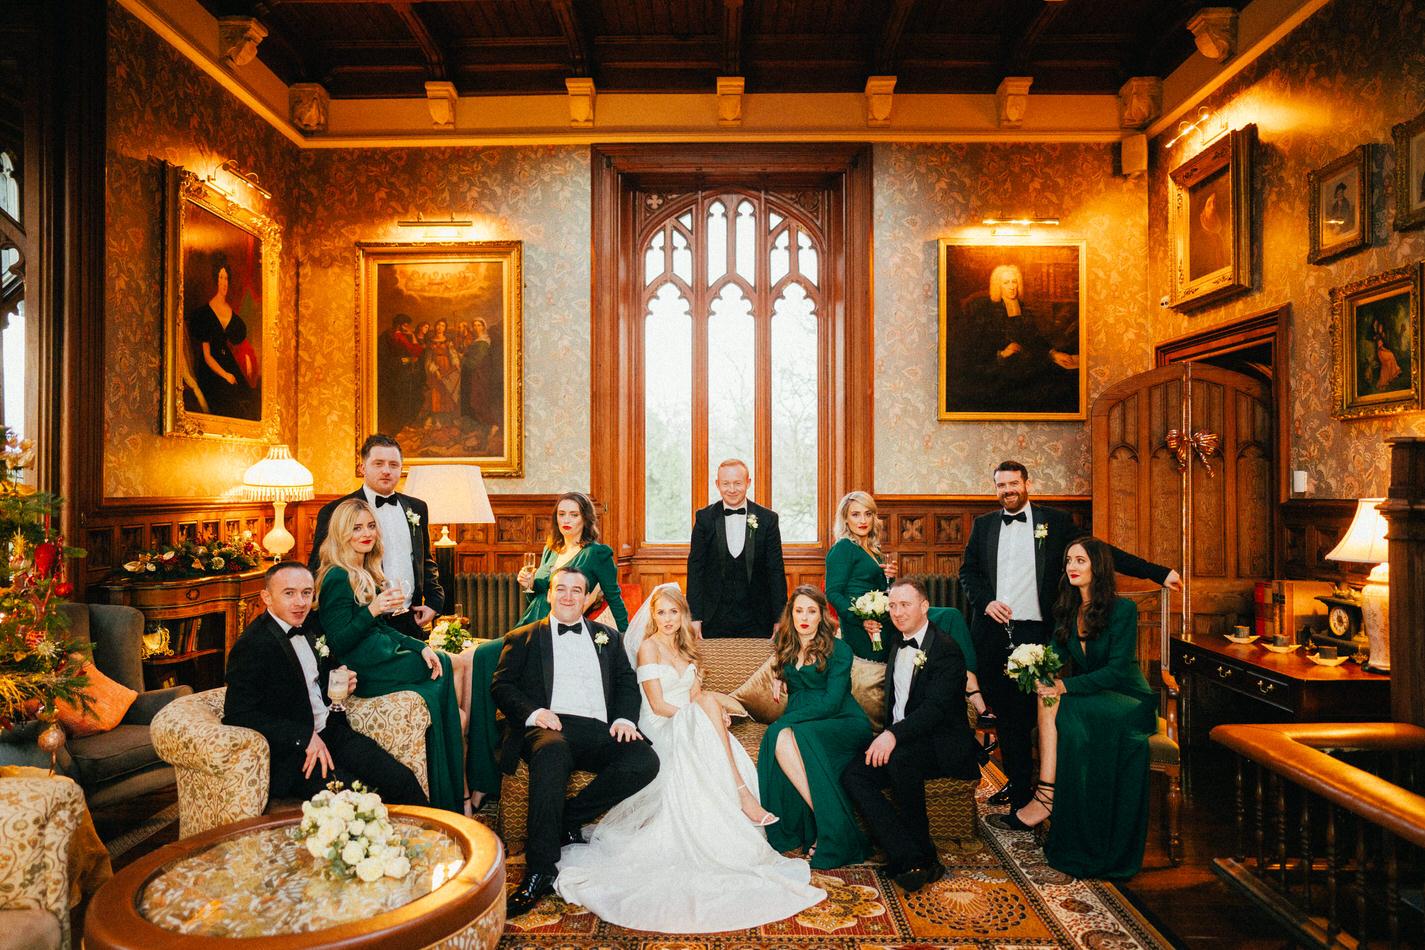 Castle-wedding-ireland-photos- 0242 181